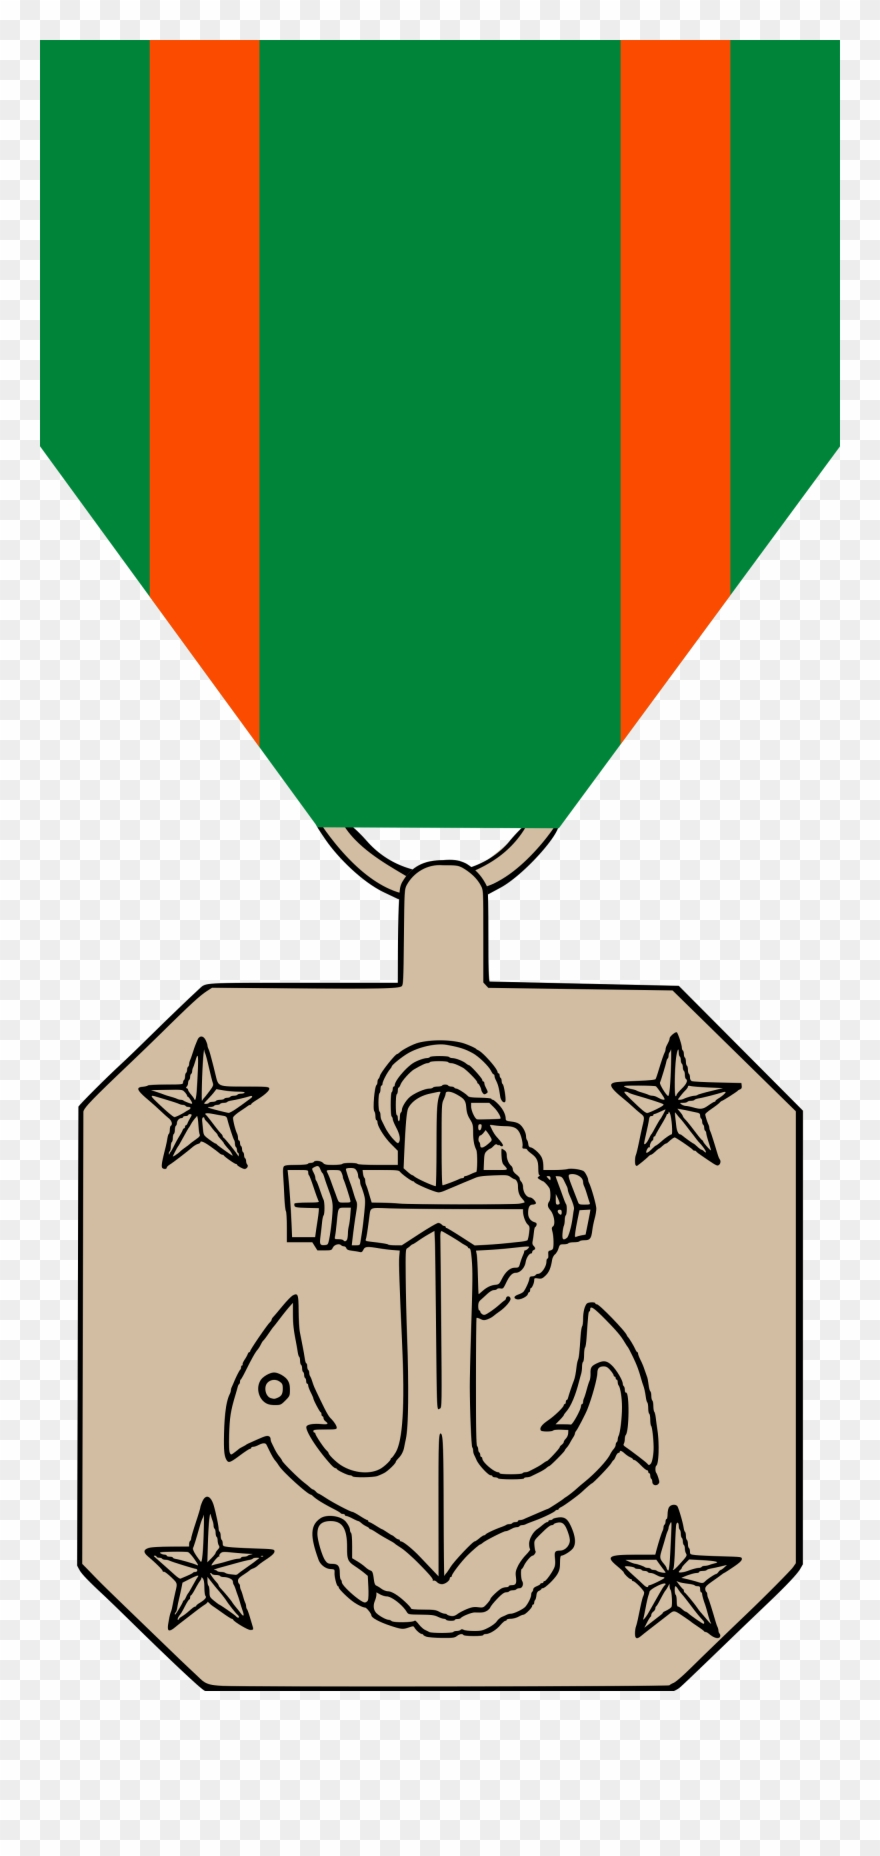 Open navy png pinclipart. Medal clipart achievement